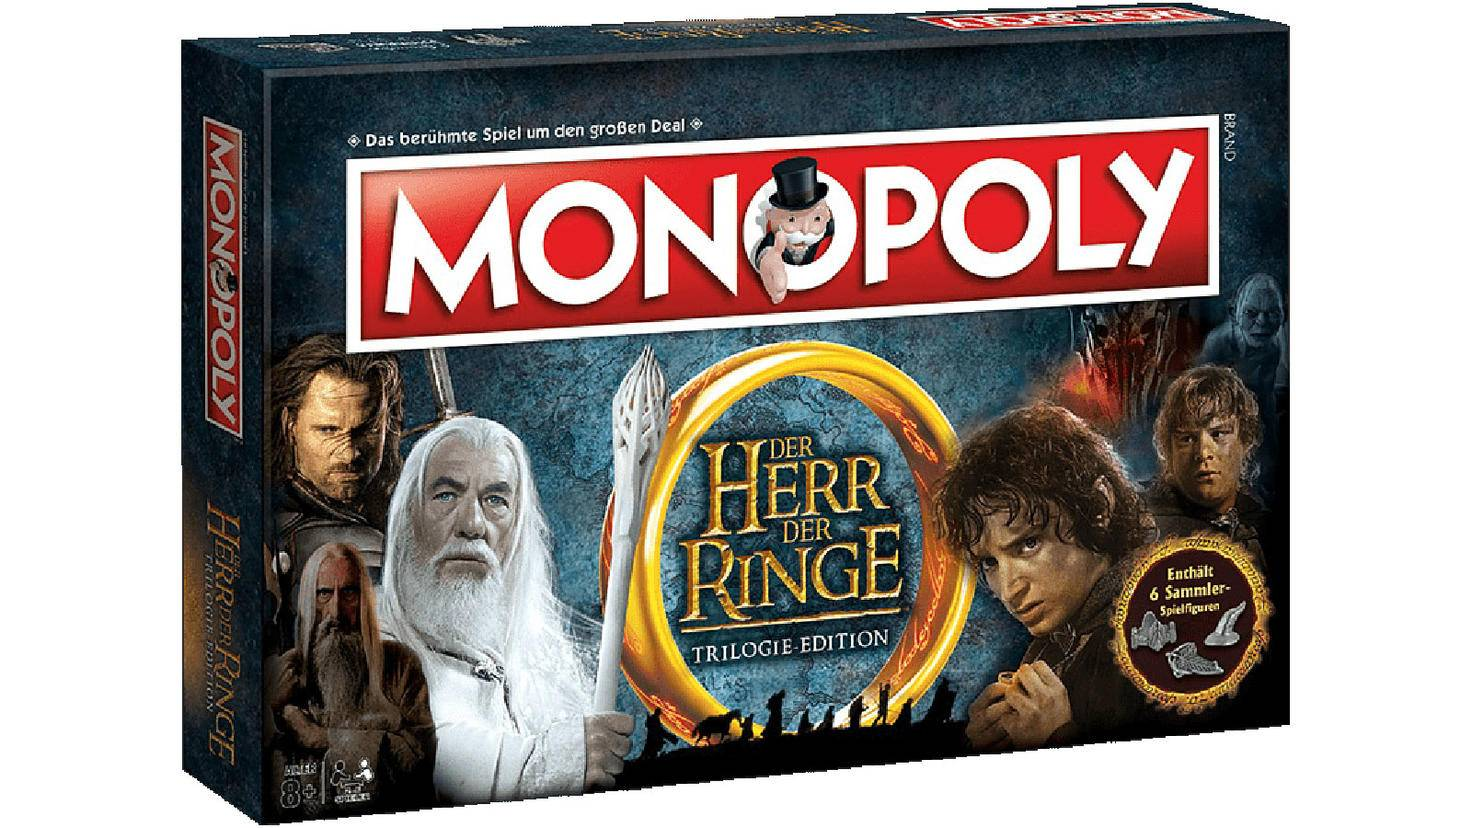 Herr der Ringe Monopoly